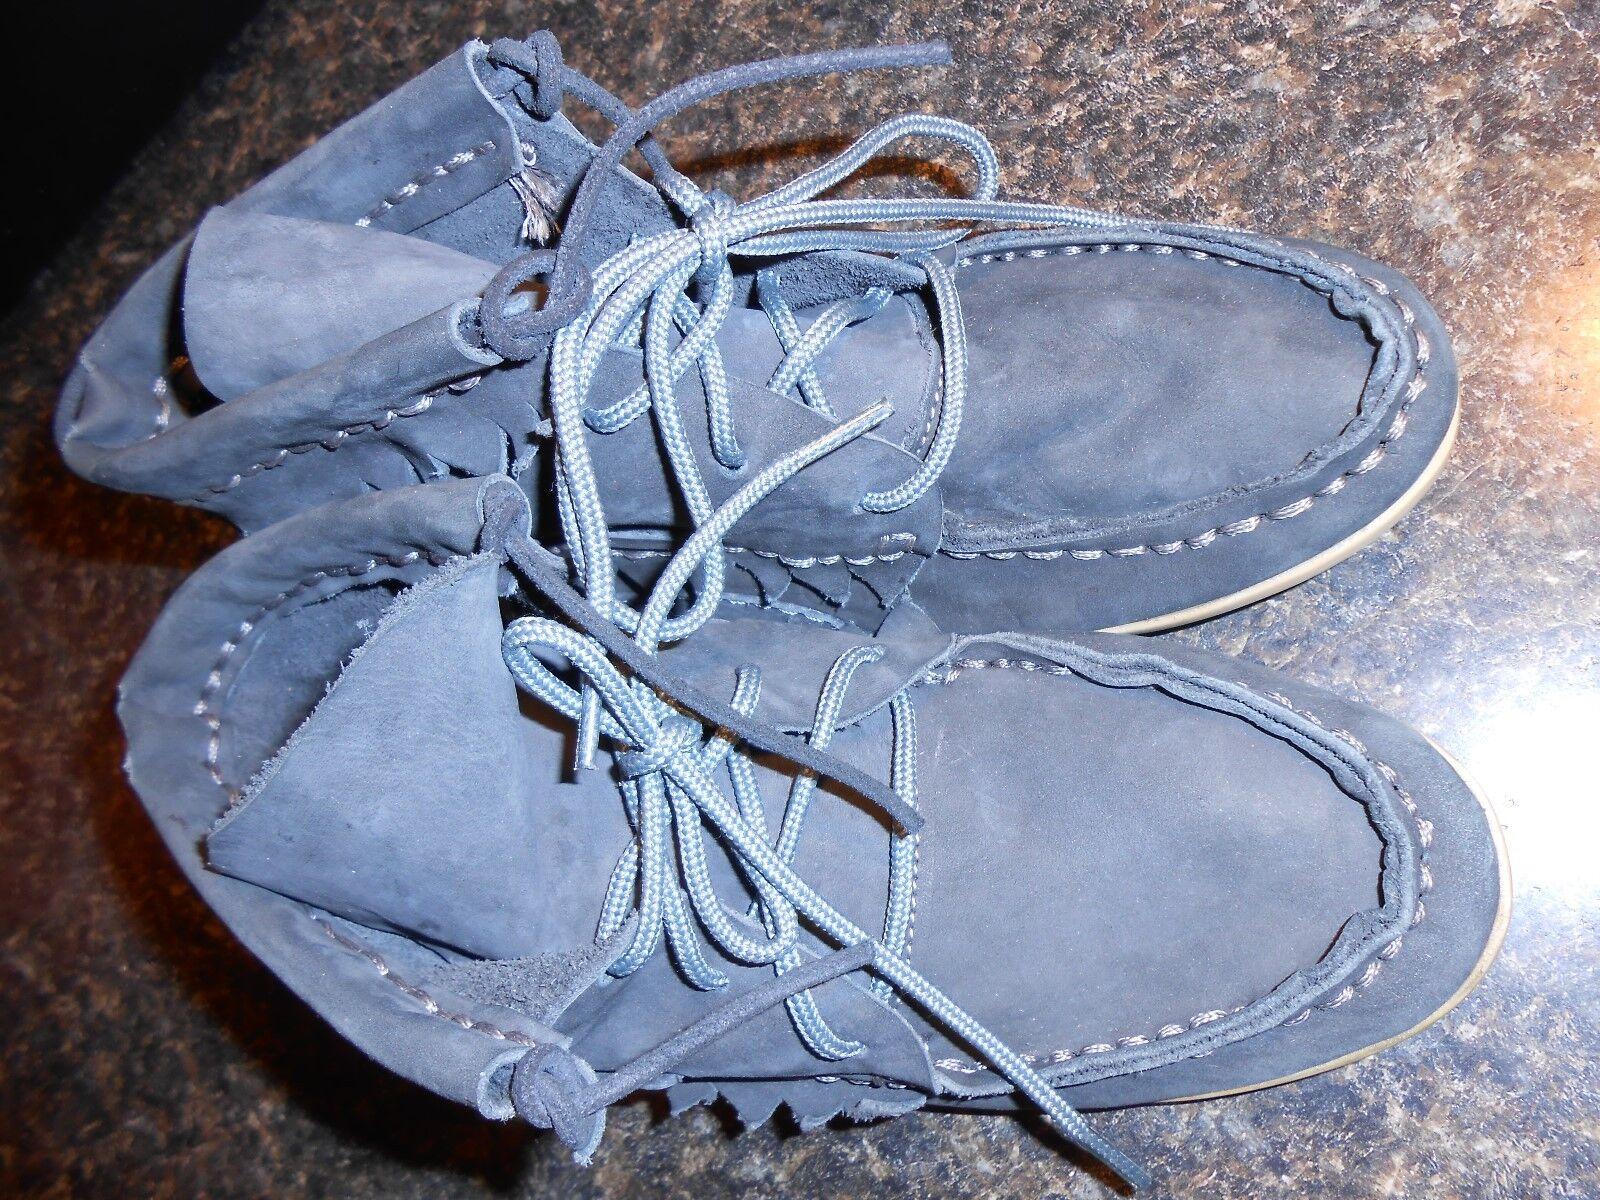 Oliberte dark Grau nubuck Leder Hirari moc boots display7M B NEU no box save